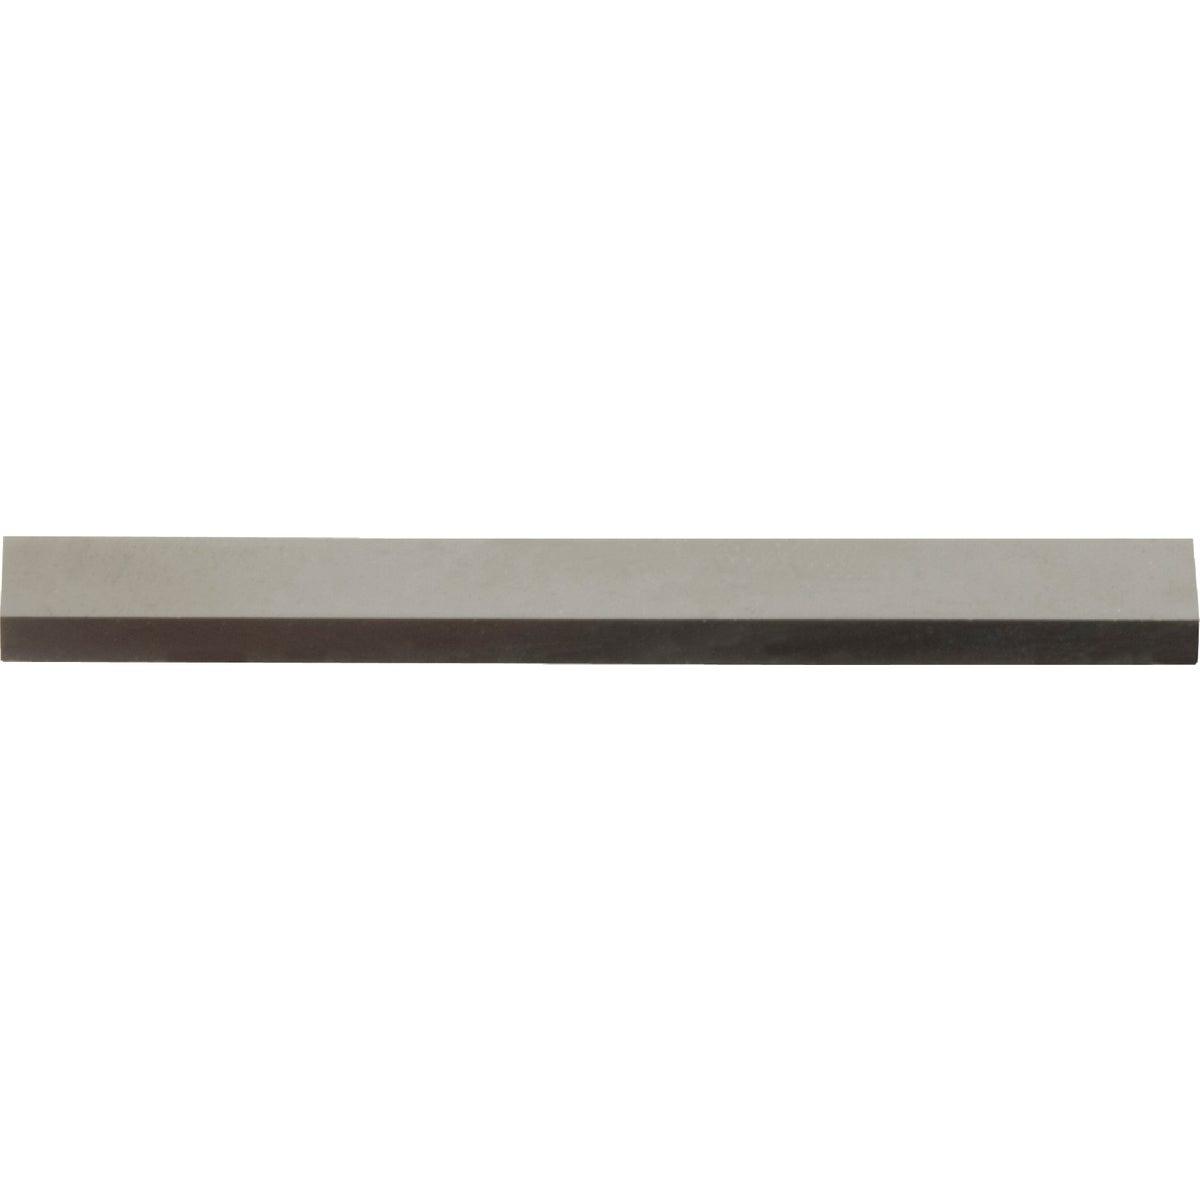 Hyde 2-Edge Carbide Replacement Scraper Blade, 11170